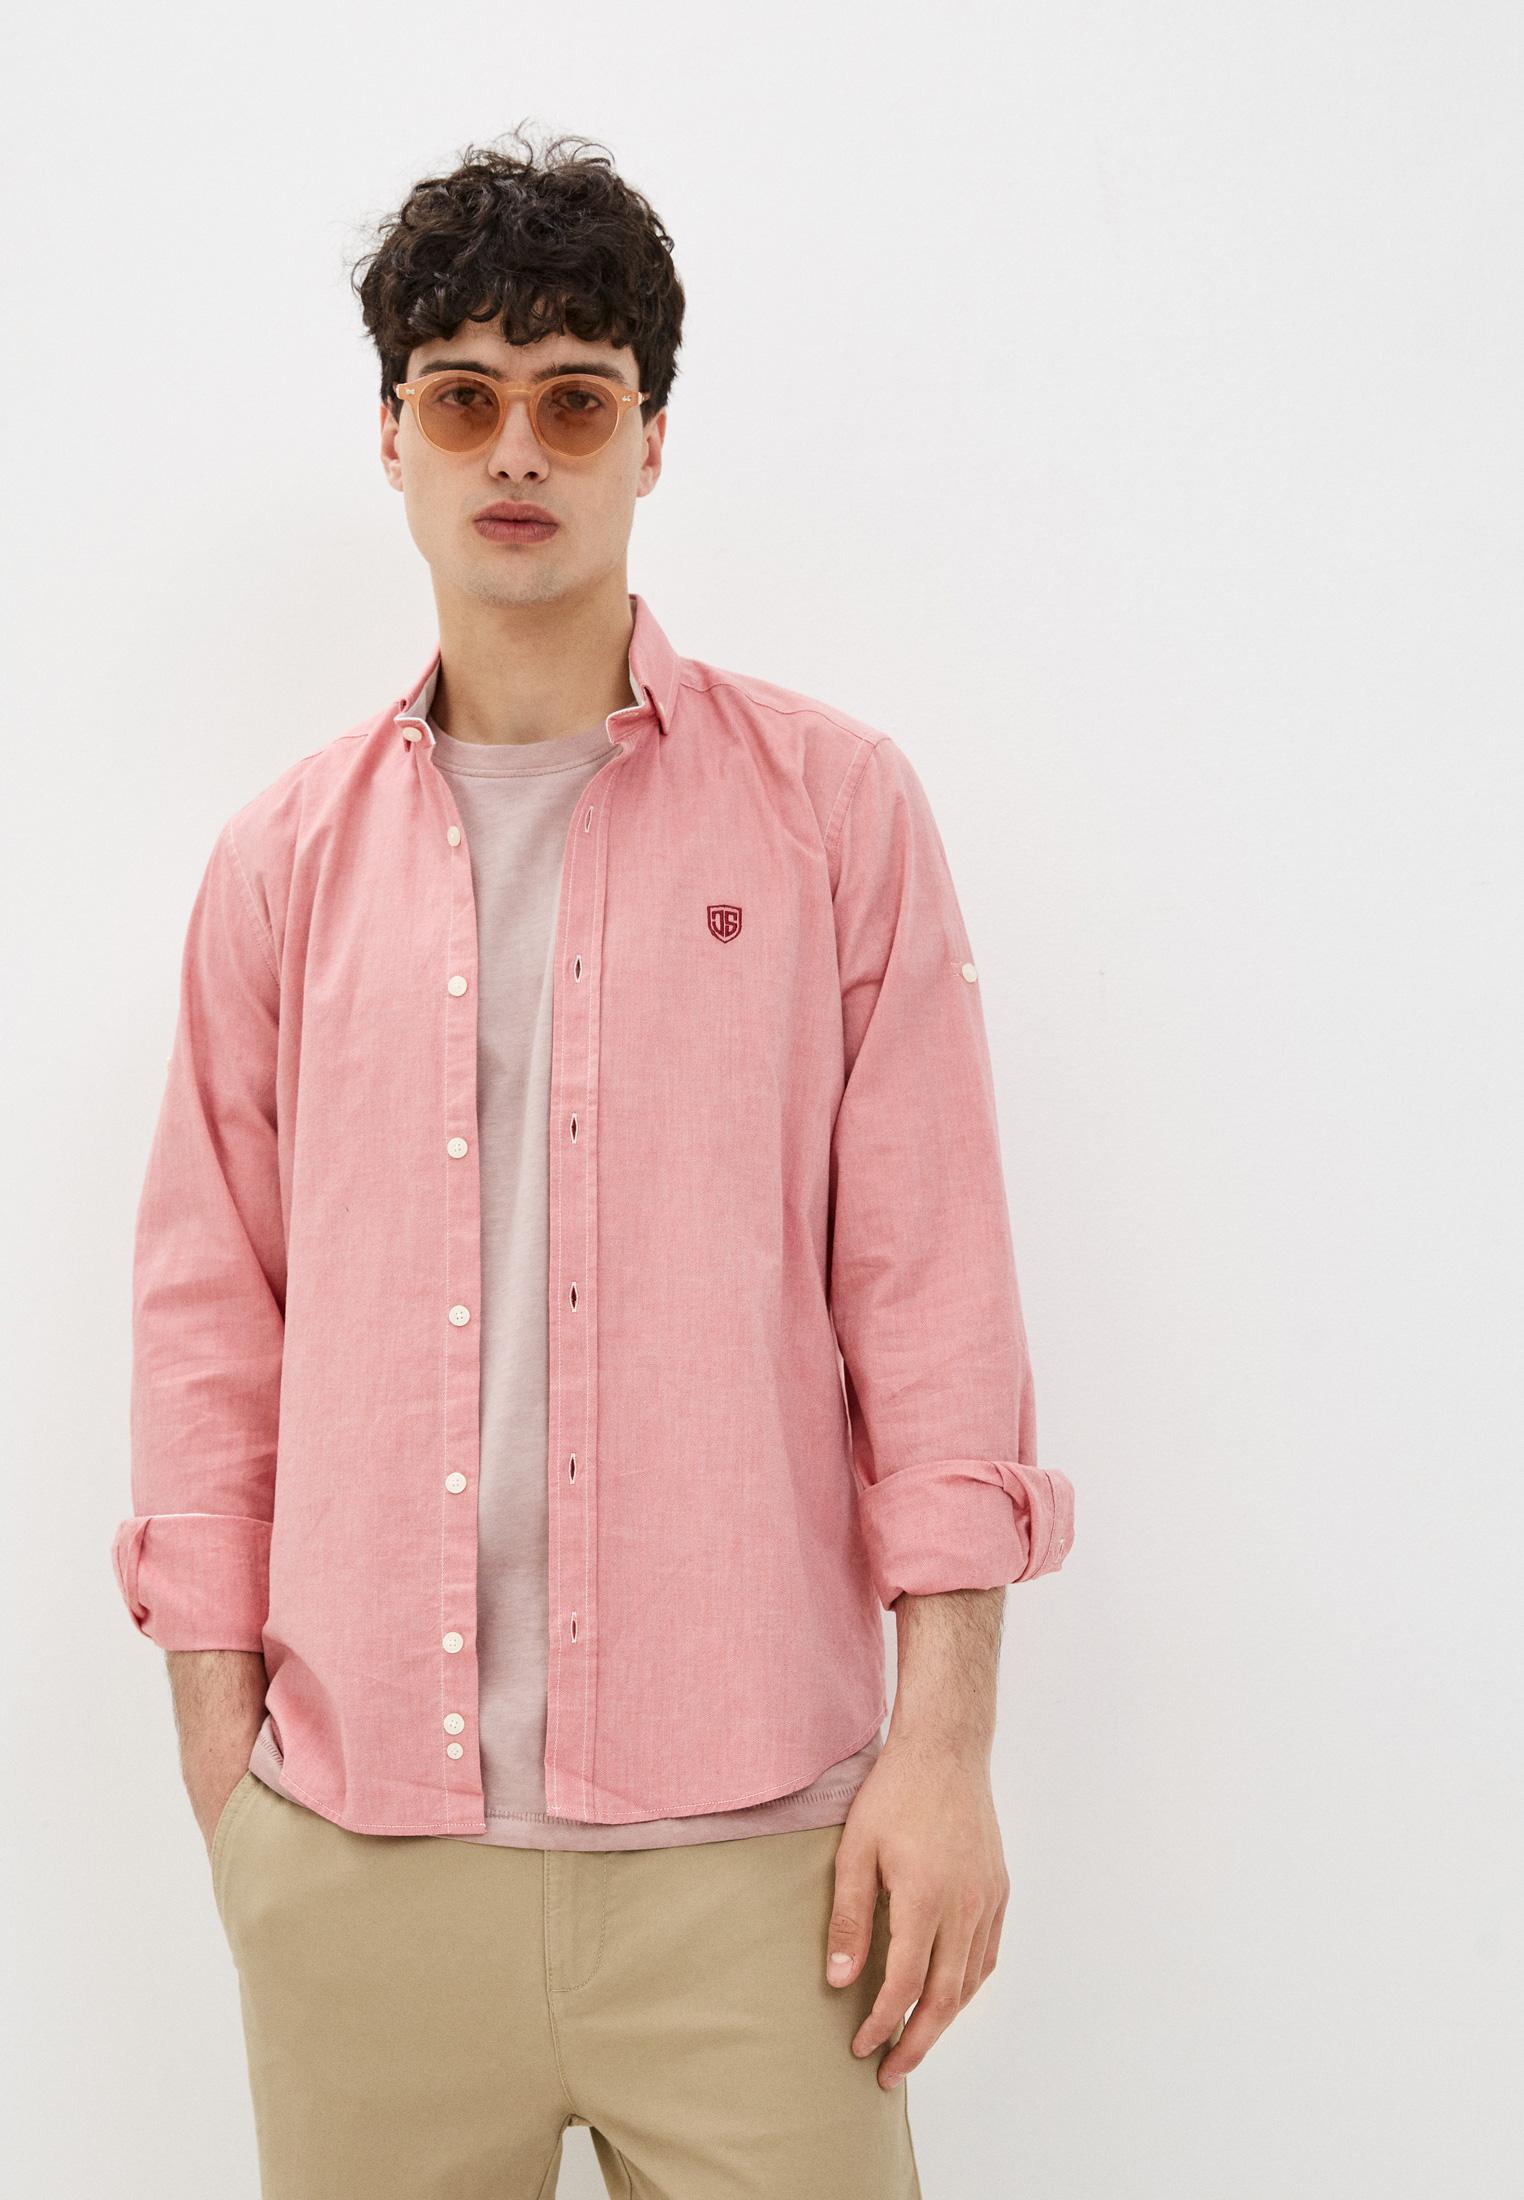 Рубашка с длинным рукавом JIMMY SANDERS (Джимми Сандерс) 20S JSMSHT0028